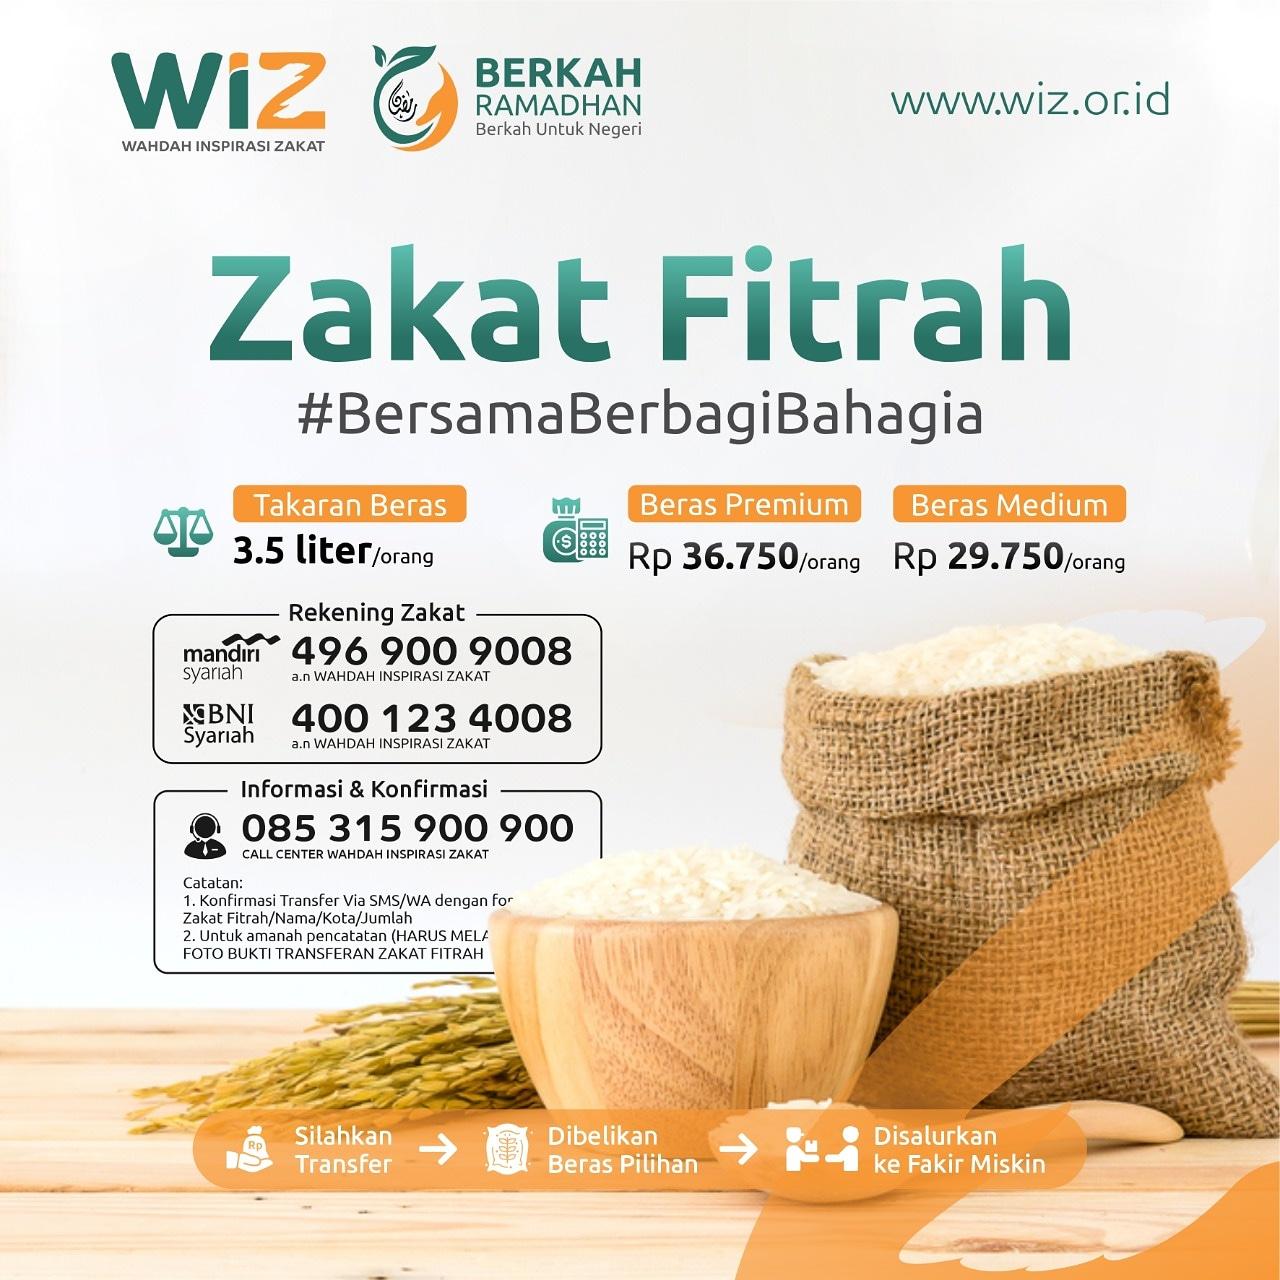 Zakat Fitrah bersama WIZ